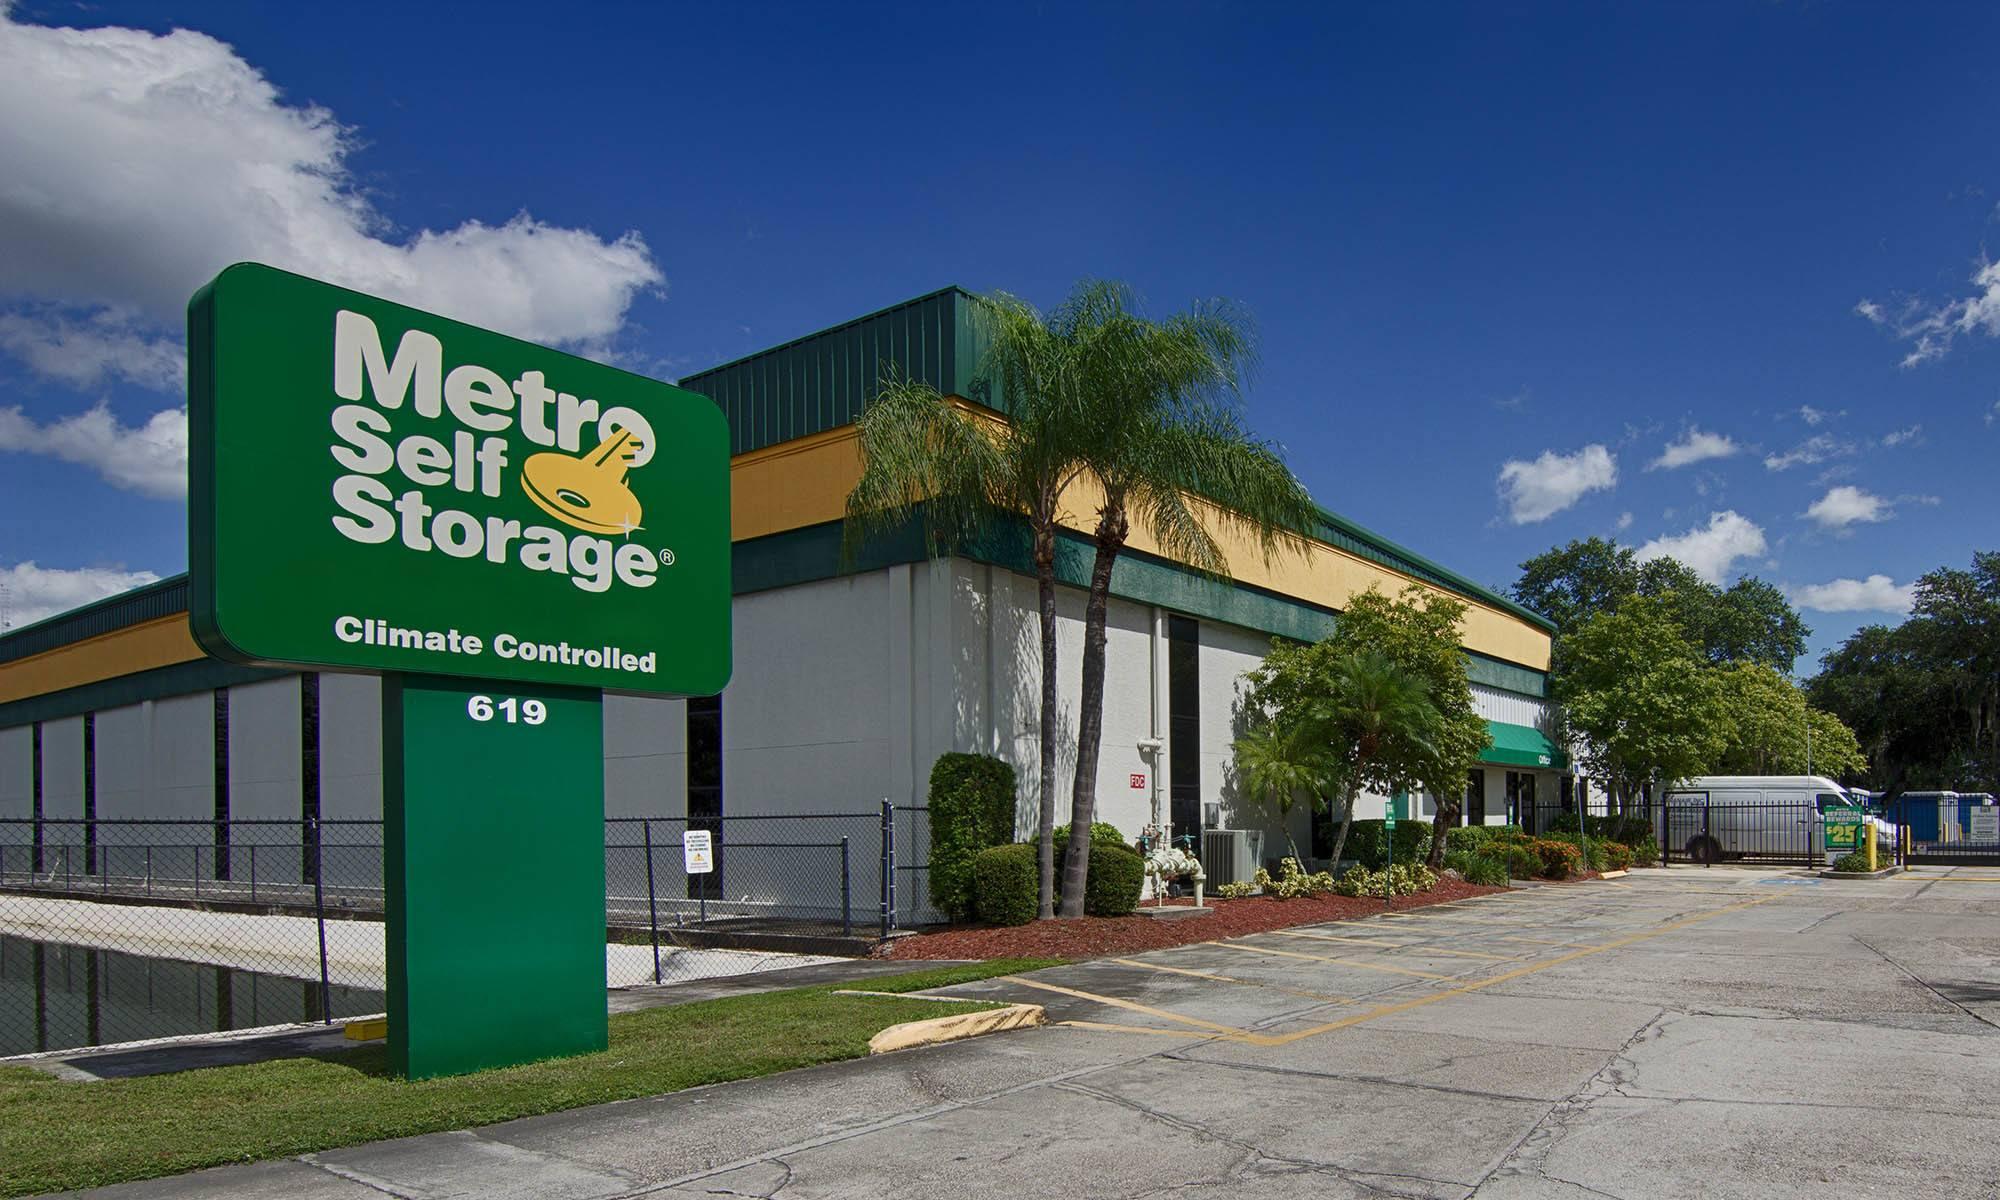 Metro Self Storage in Sarasota, FL